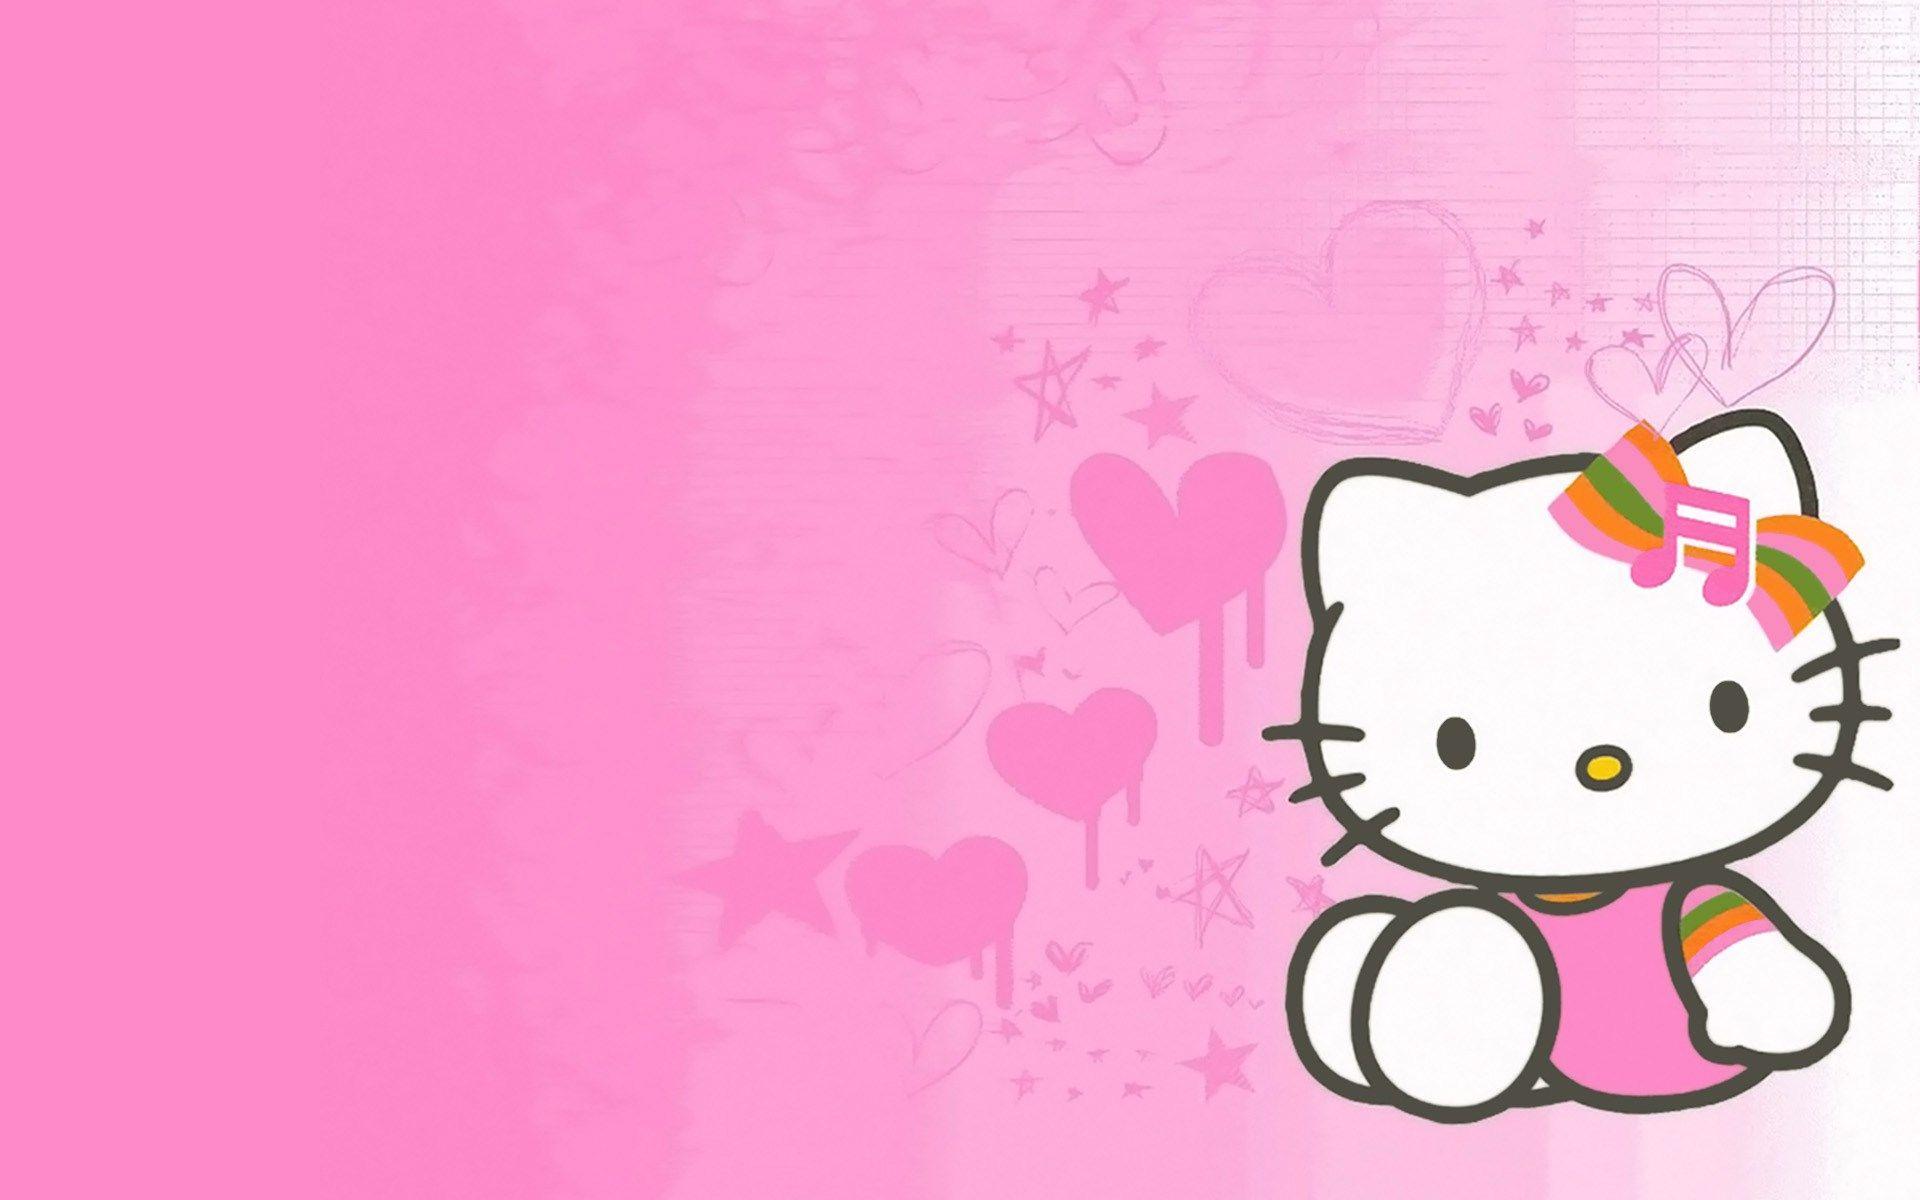 Beautiful Wallpaper Hello Kitty Computer - 79b0a8f05115bbee8dd518013601368b  You Should Have_675414.jpg